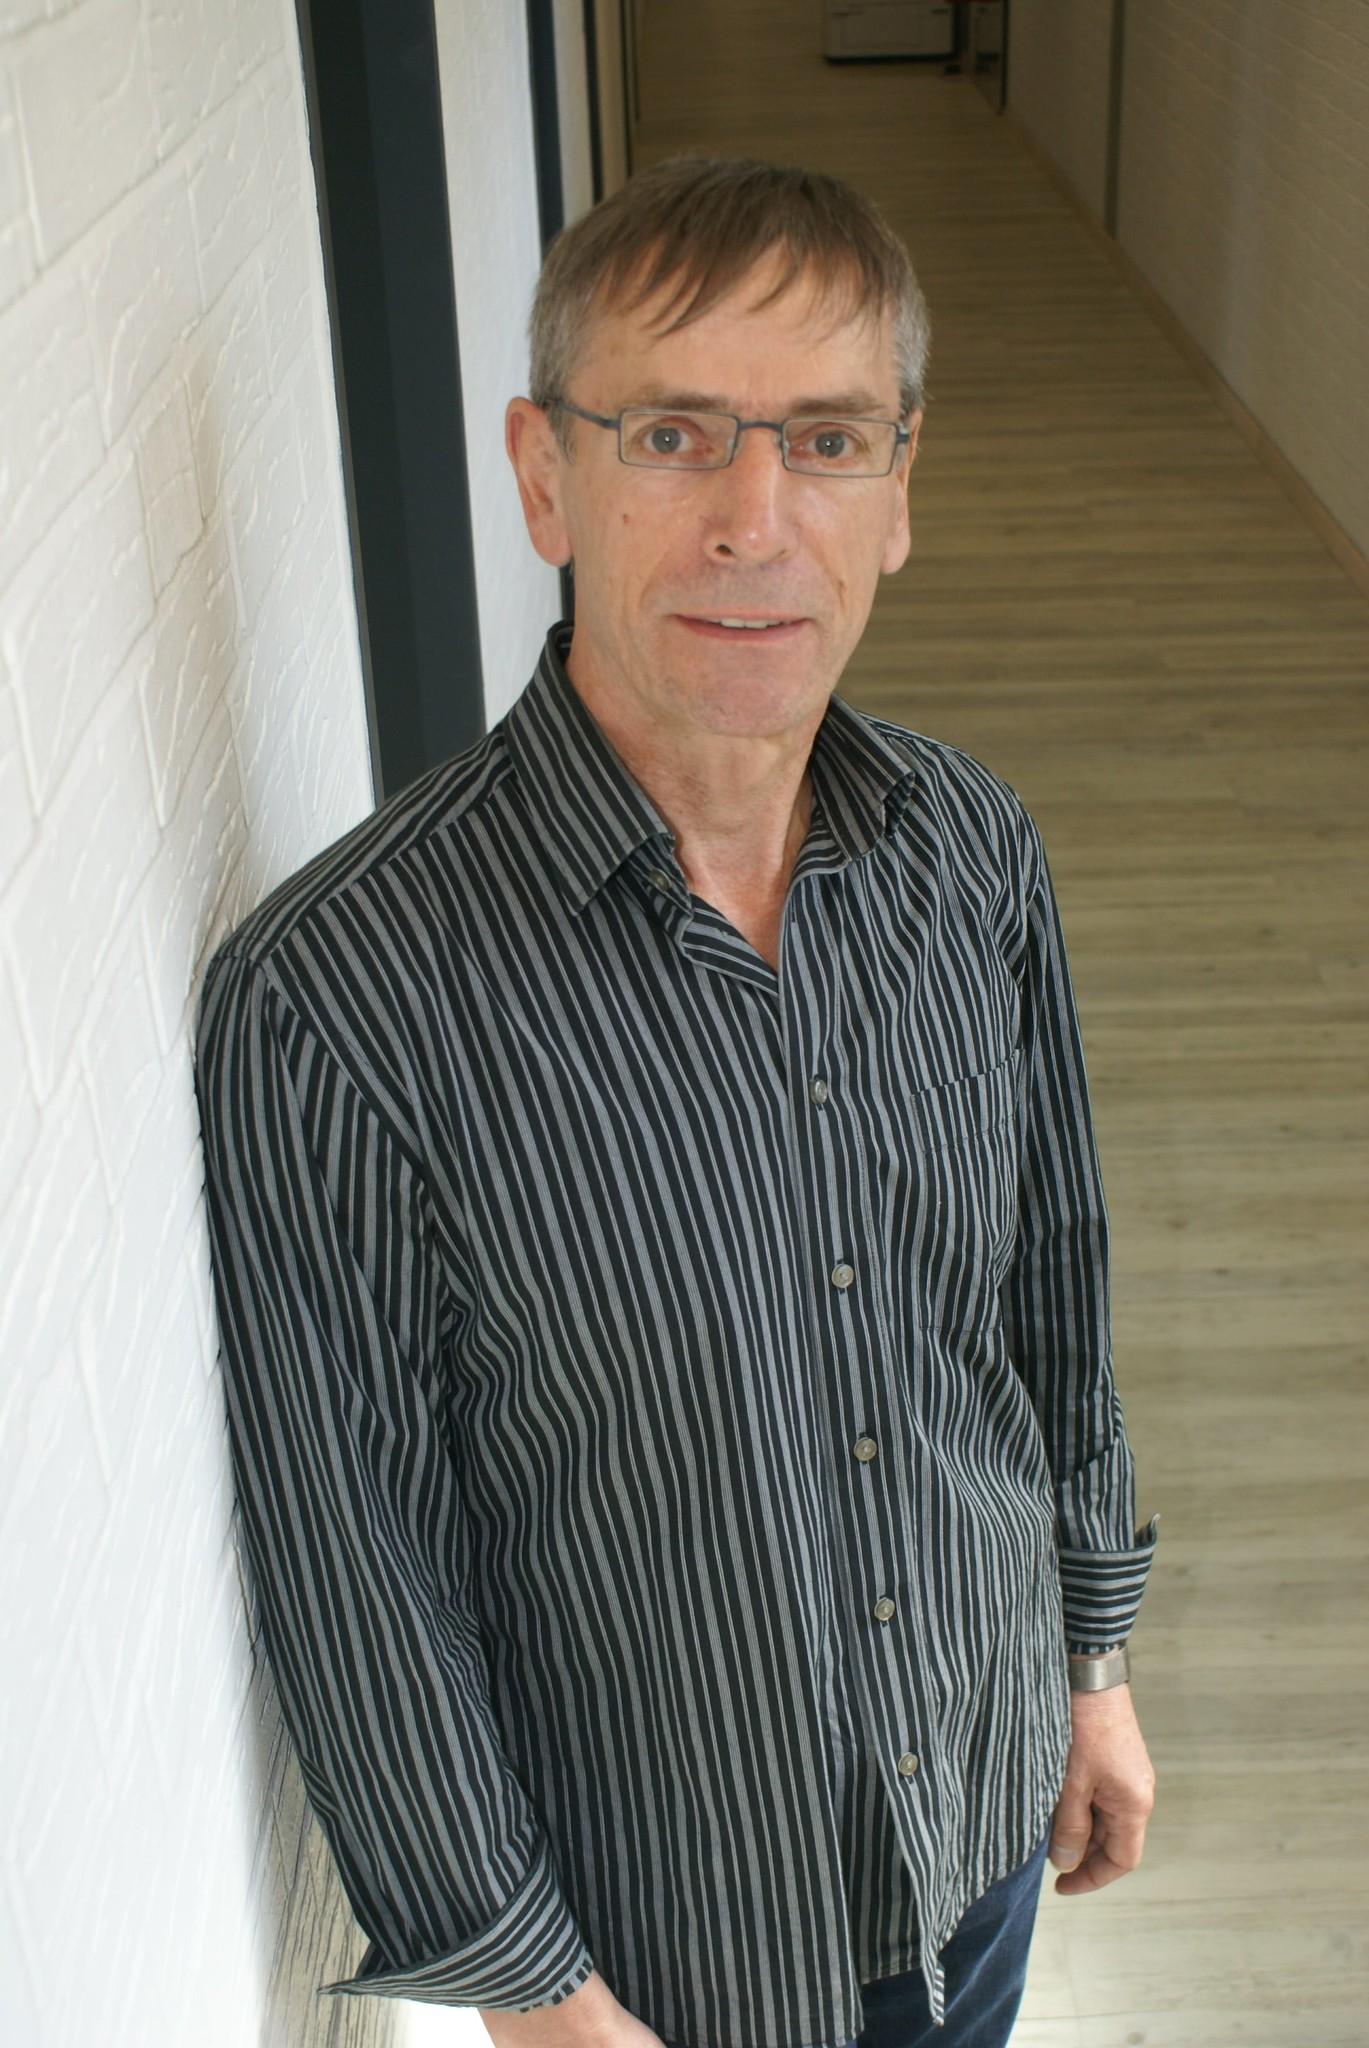 Geschäftsführer Martin Contzen